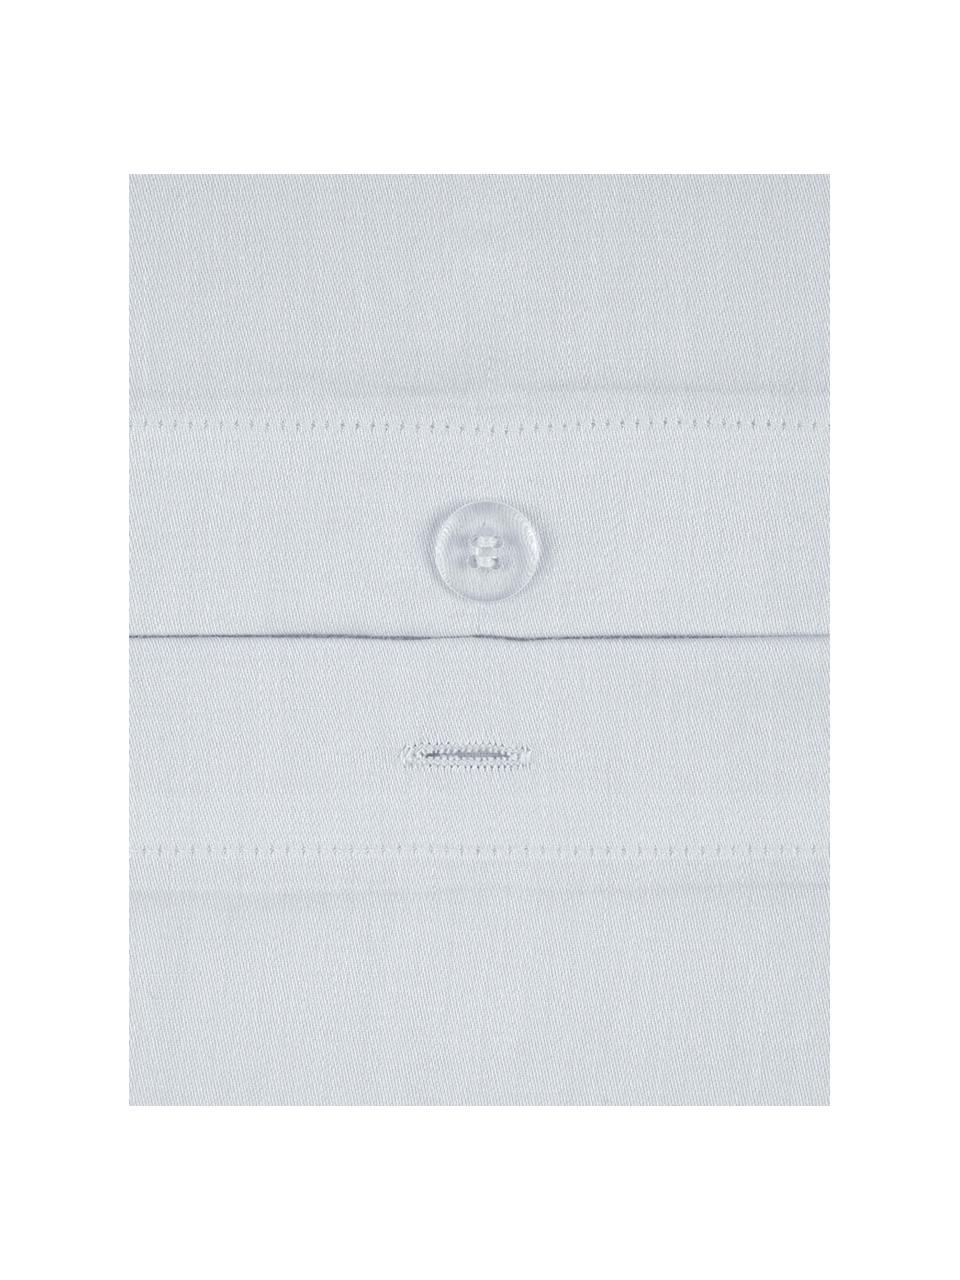 Baumwollsatin-Kopfkissenbezüge Comfort in Hellgrau, 2 Stück, Webart: Satin Fadendichte 250 TC,, Hellgrau, 40 x 80 cm